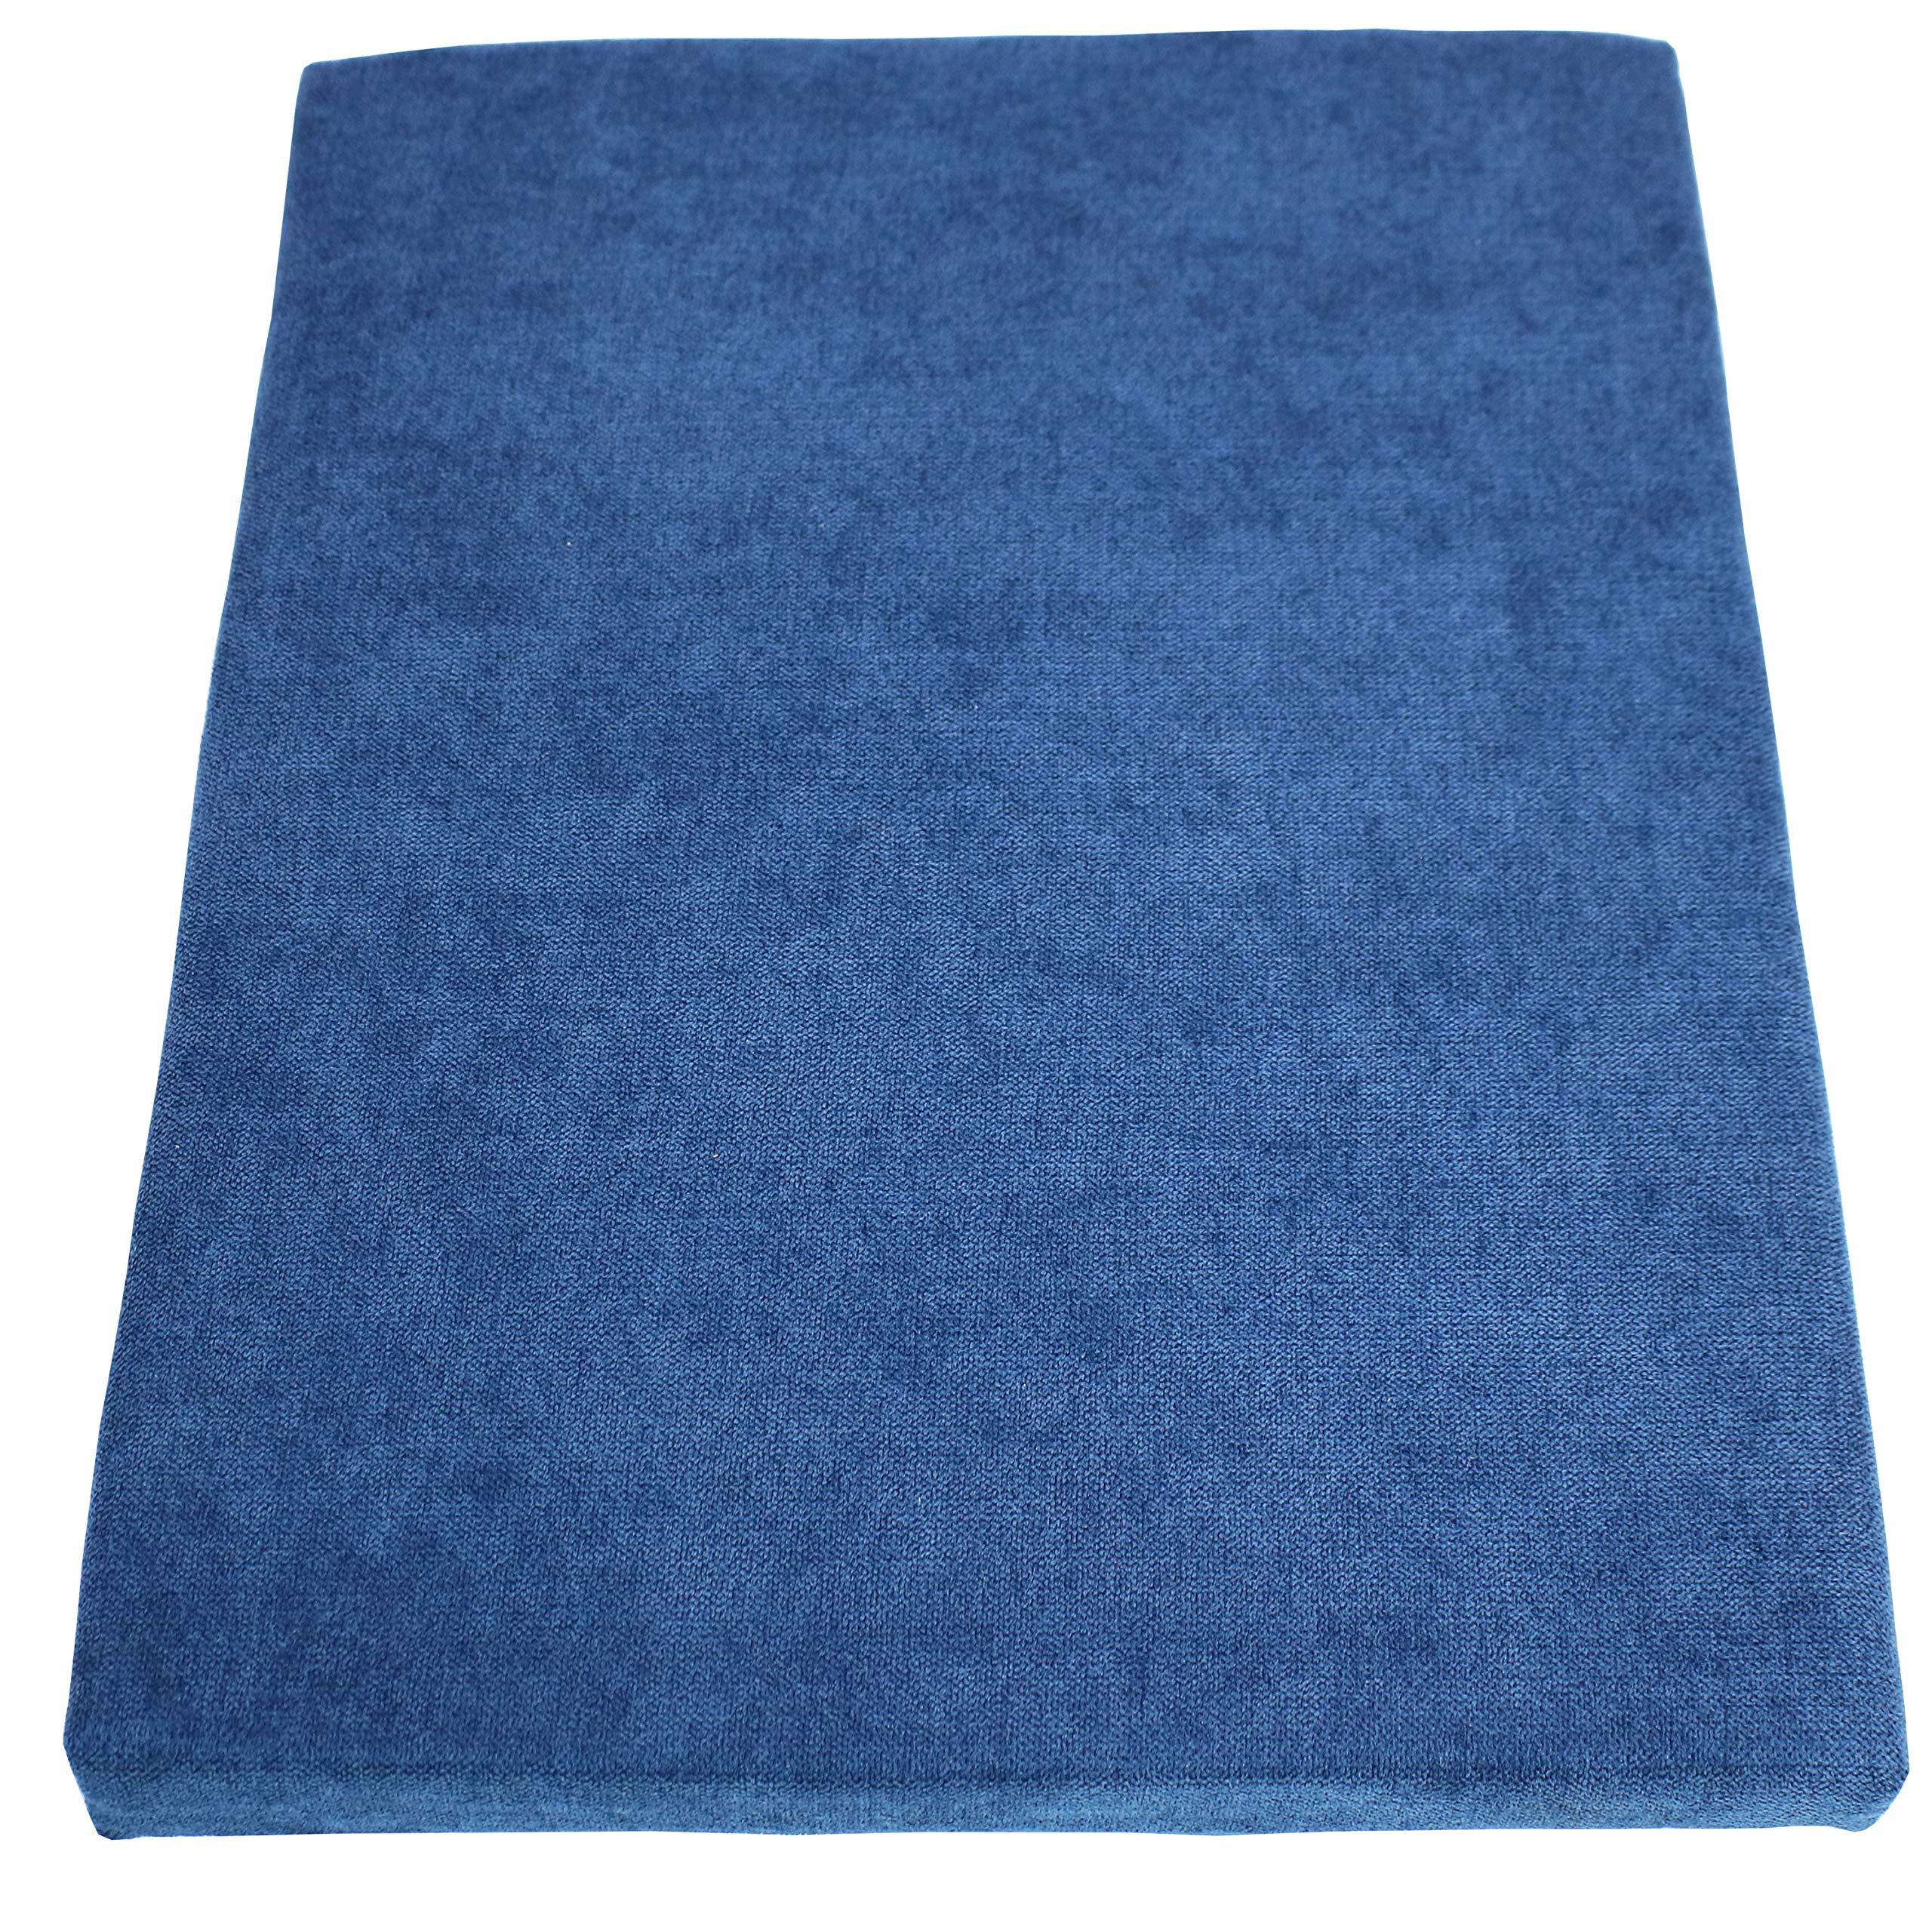 CASL Brands File Cabinet Cushion Seat Top for Mobile Pedestals, Magnetic Back, Blue by CASL Brands (Image #3)